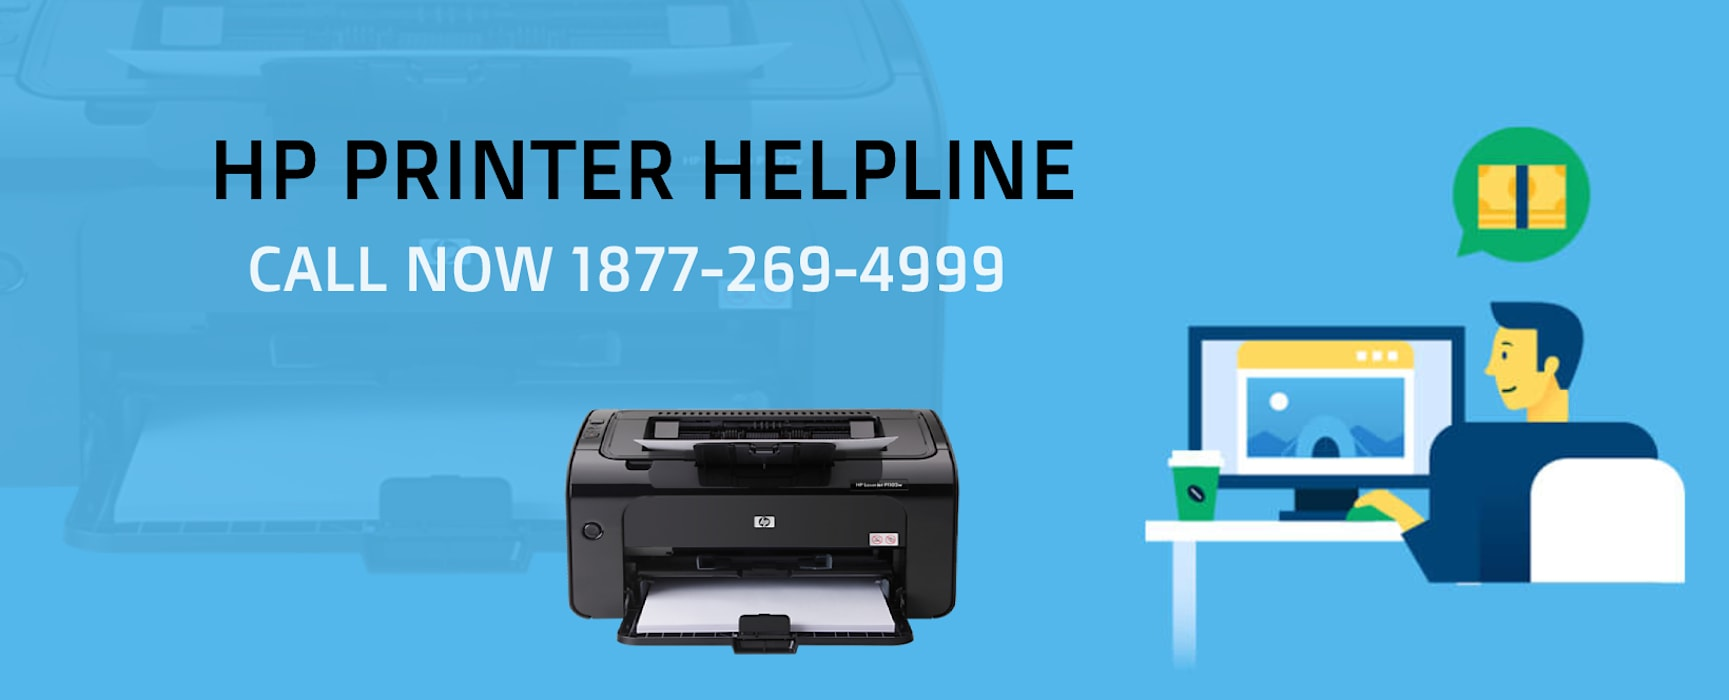 Офисы и магазины в стиле кантри от HP Printer Customer Care Number 1877-269-4999 Кантри Алюминий / Цинк